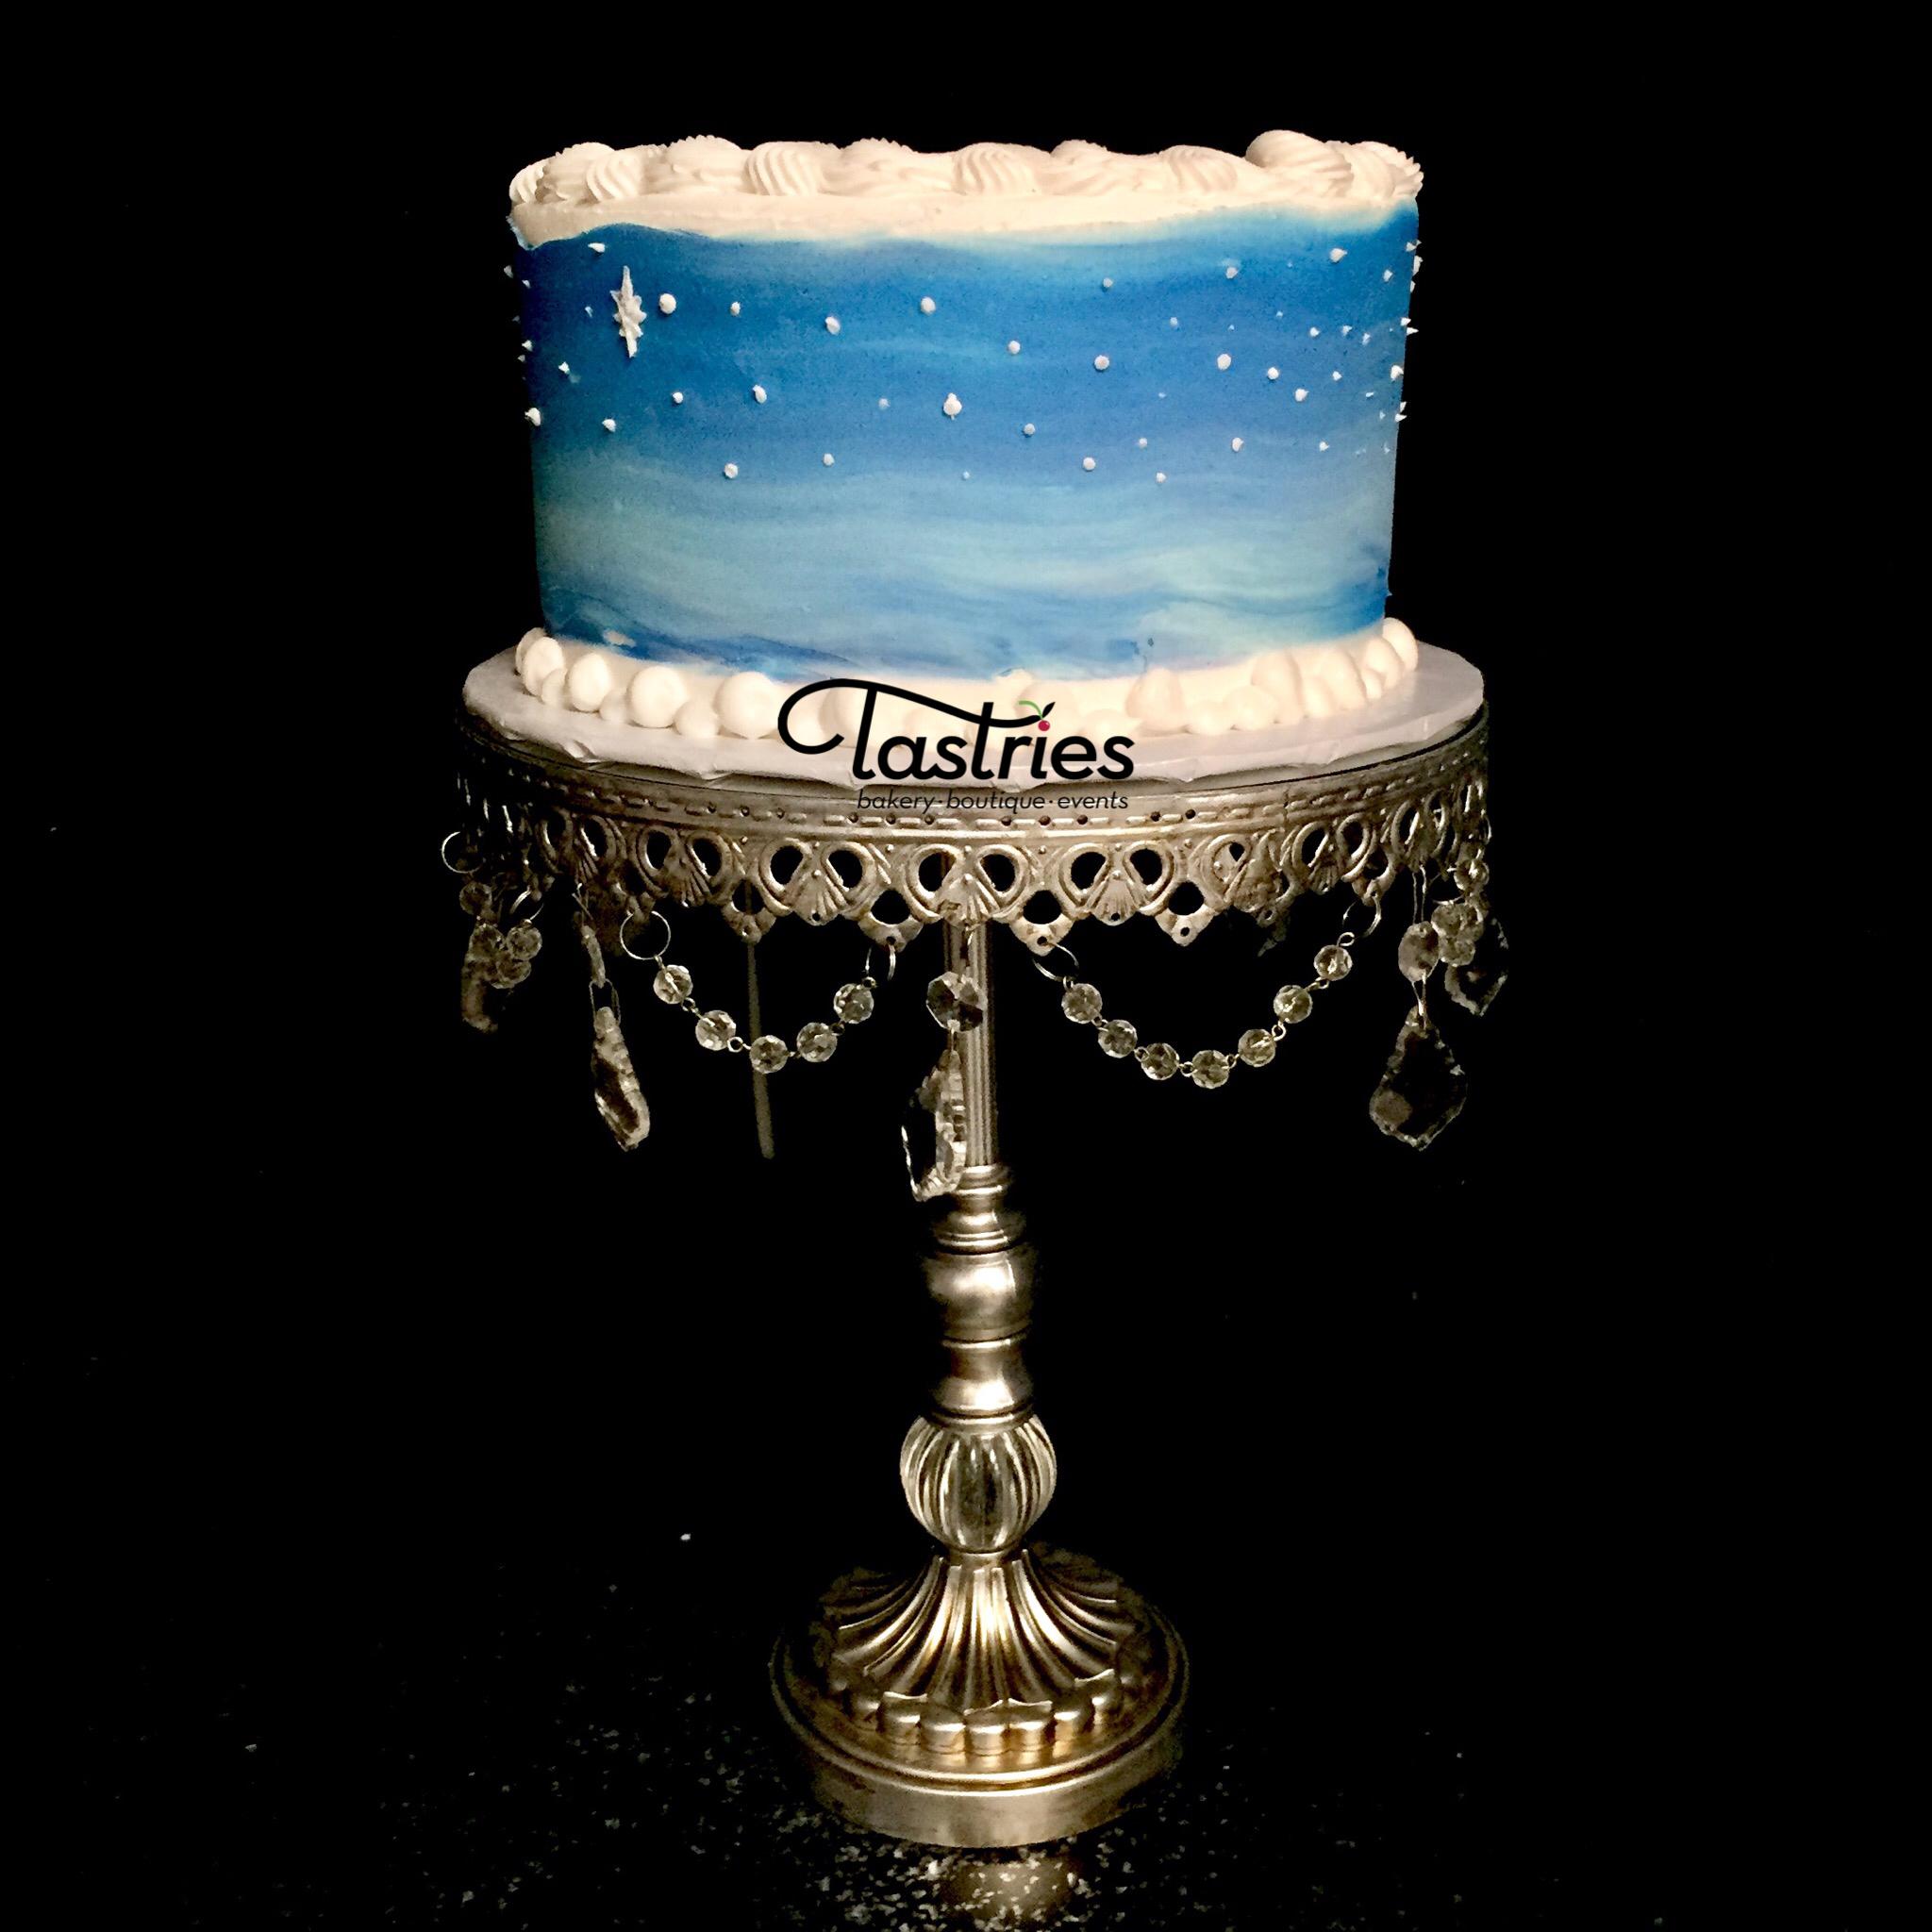 Blue Winter Dessert Cake, Tastries